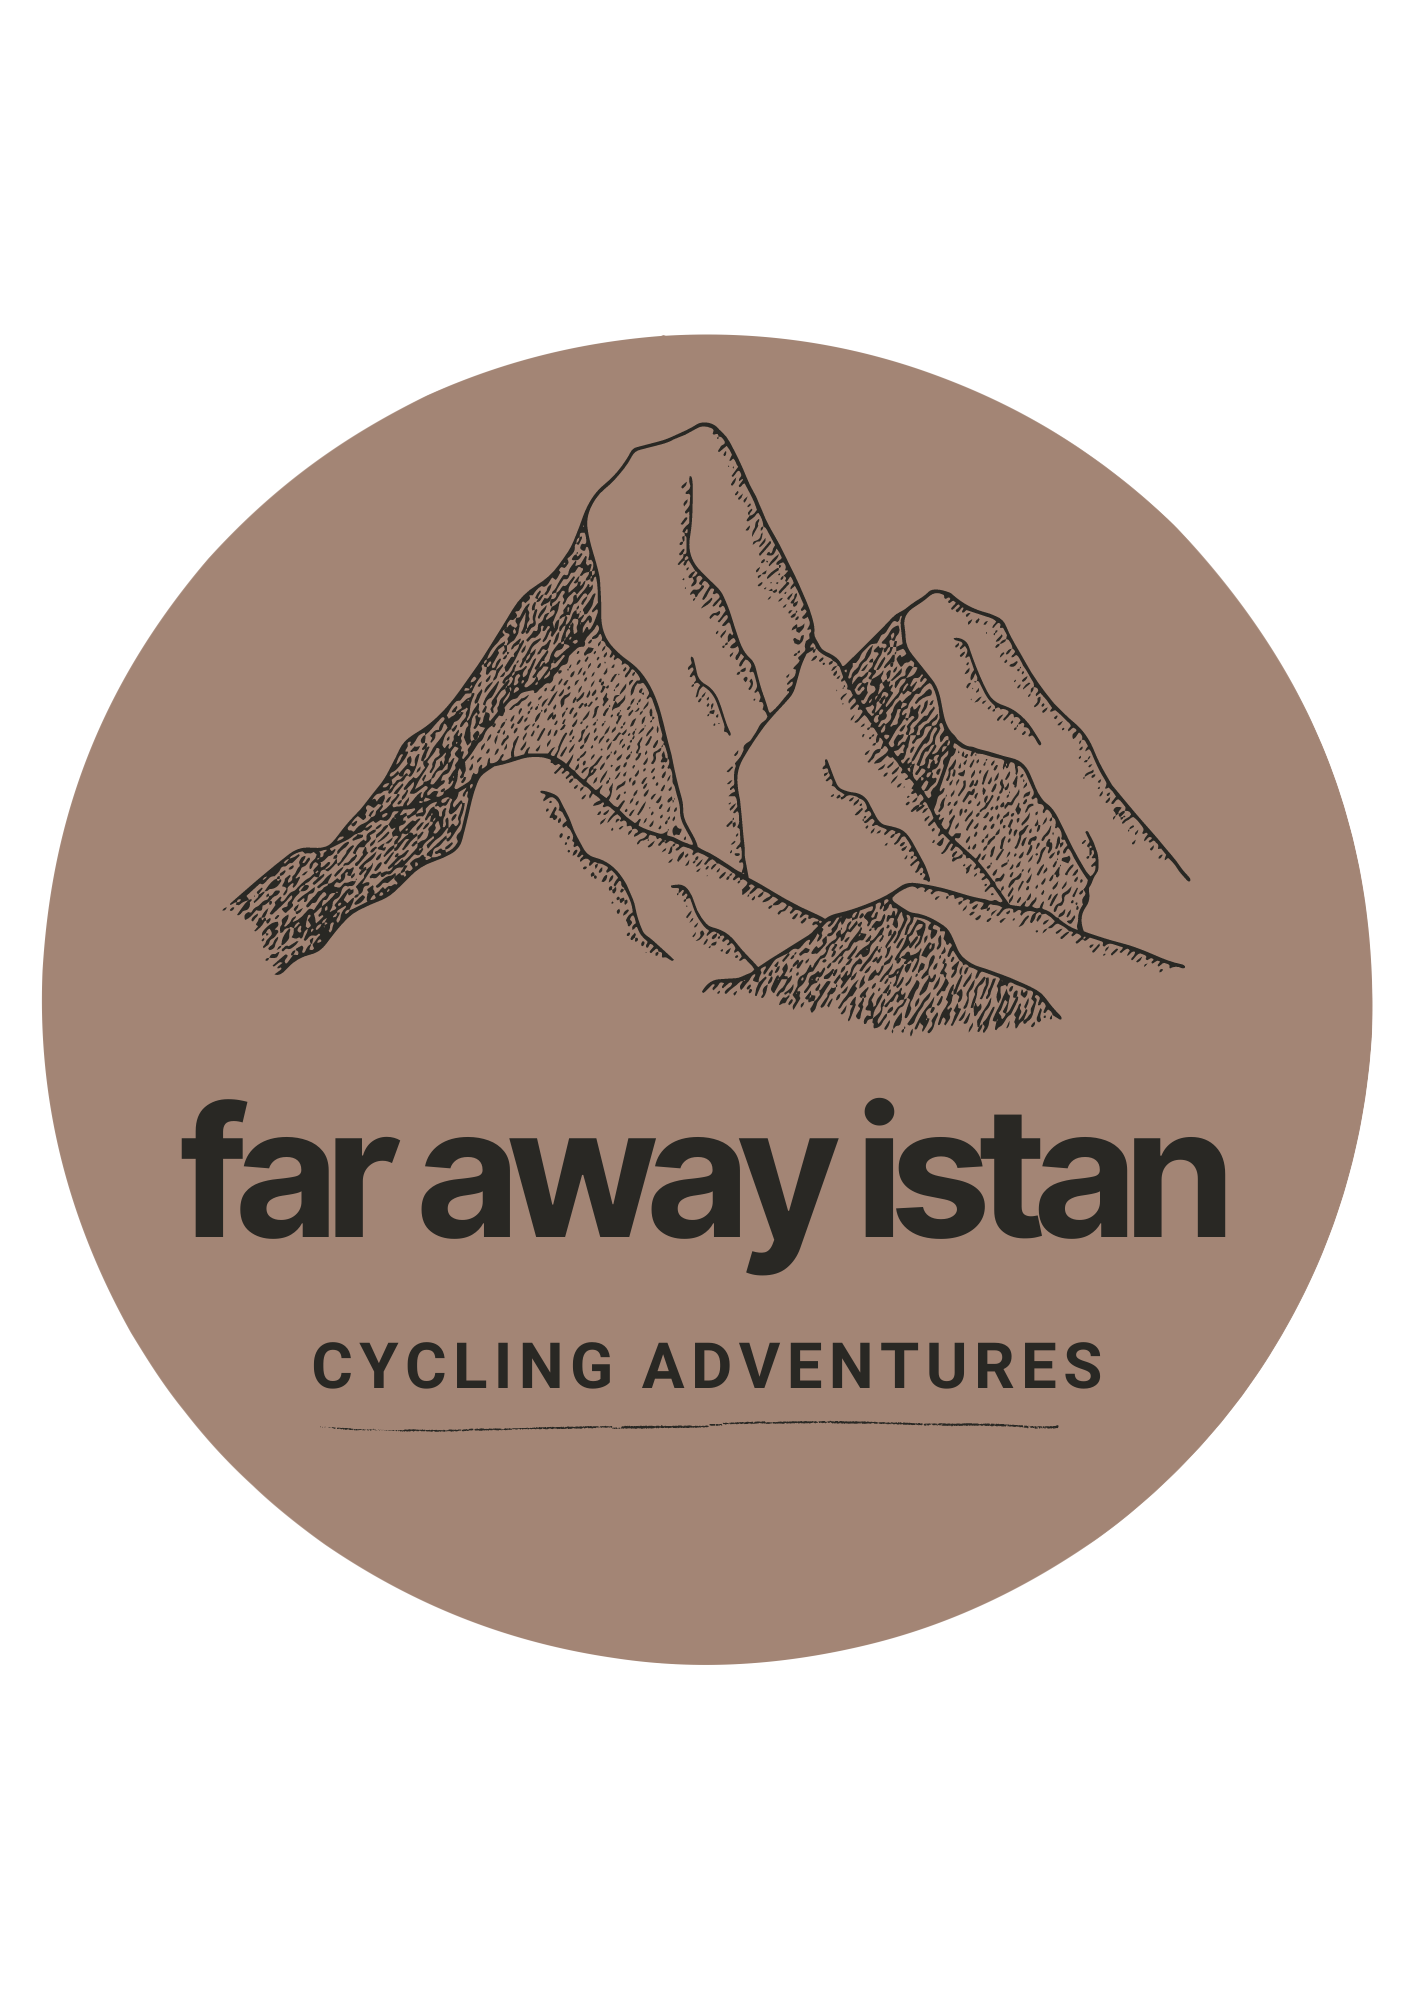 Farawayistan